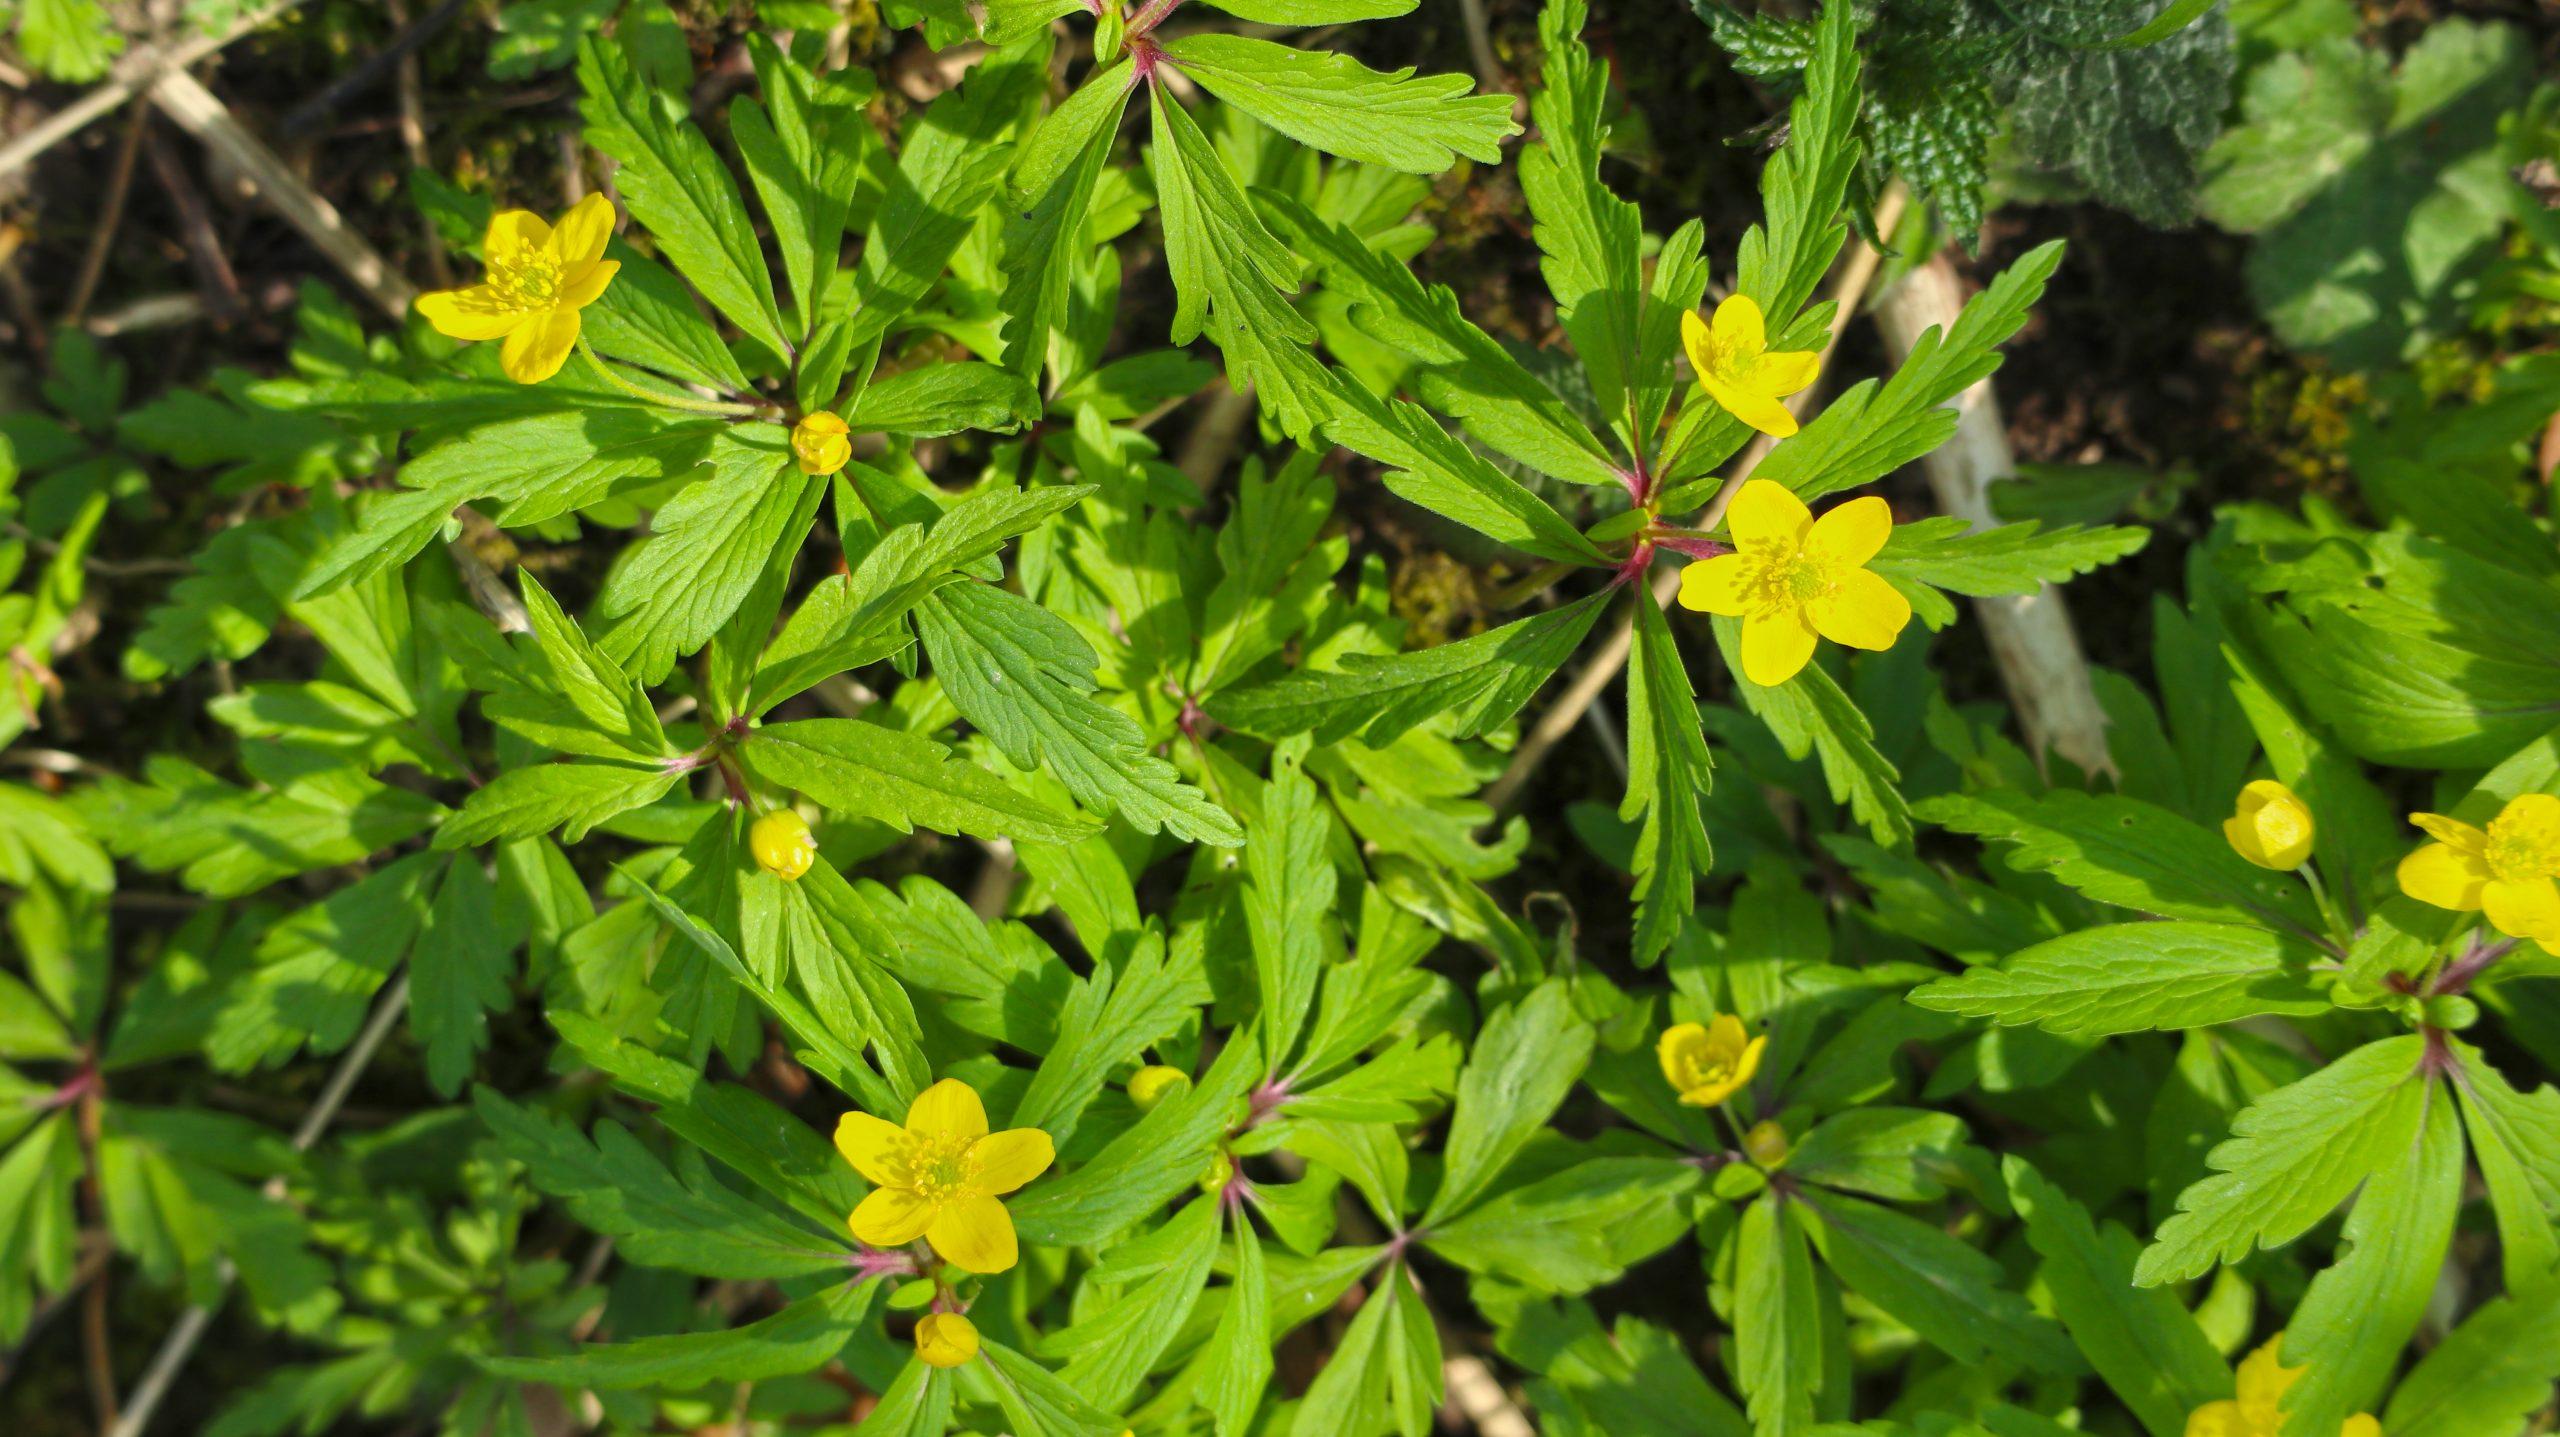 Zlatičnata vetrnica, Anemone ranunculoides